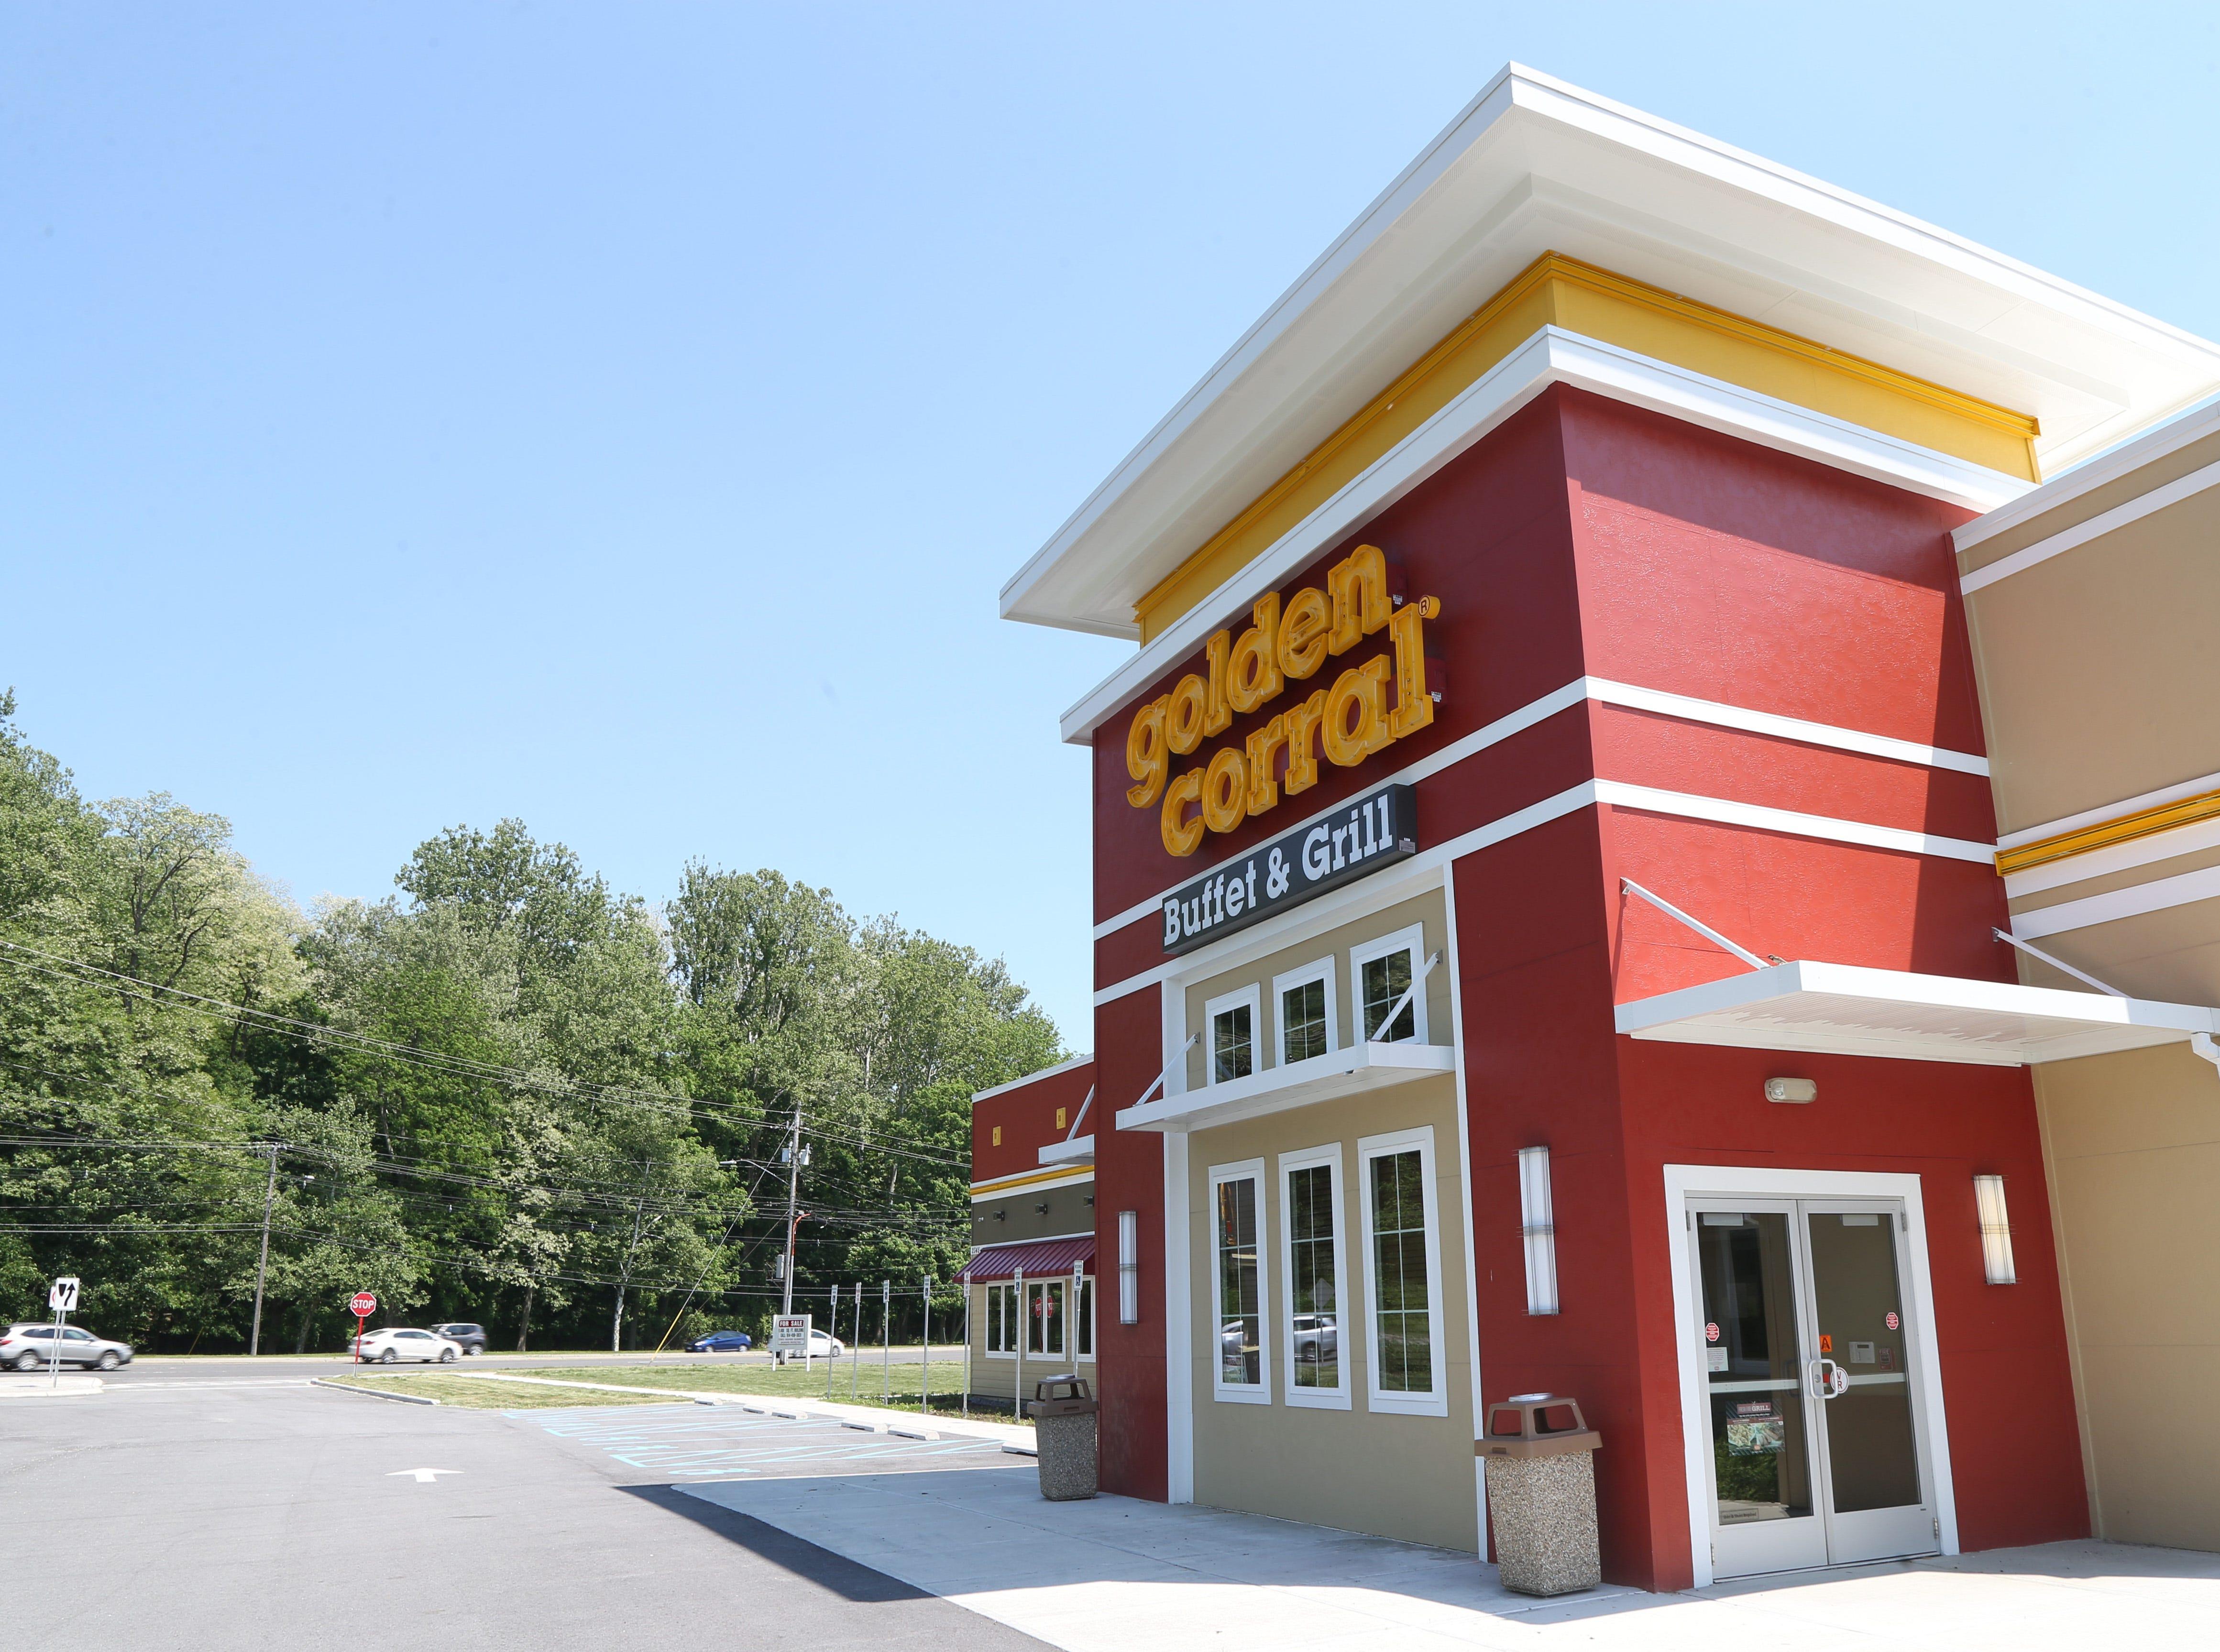 Golden Corral to open Tuesday in Poughkeepsie